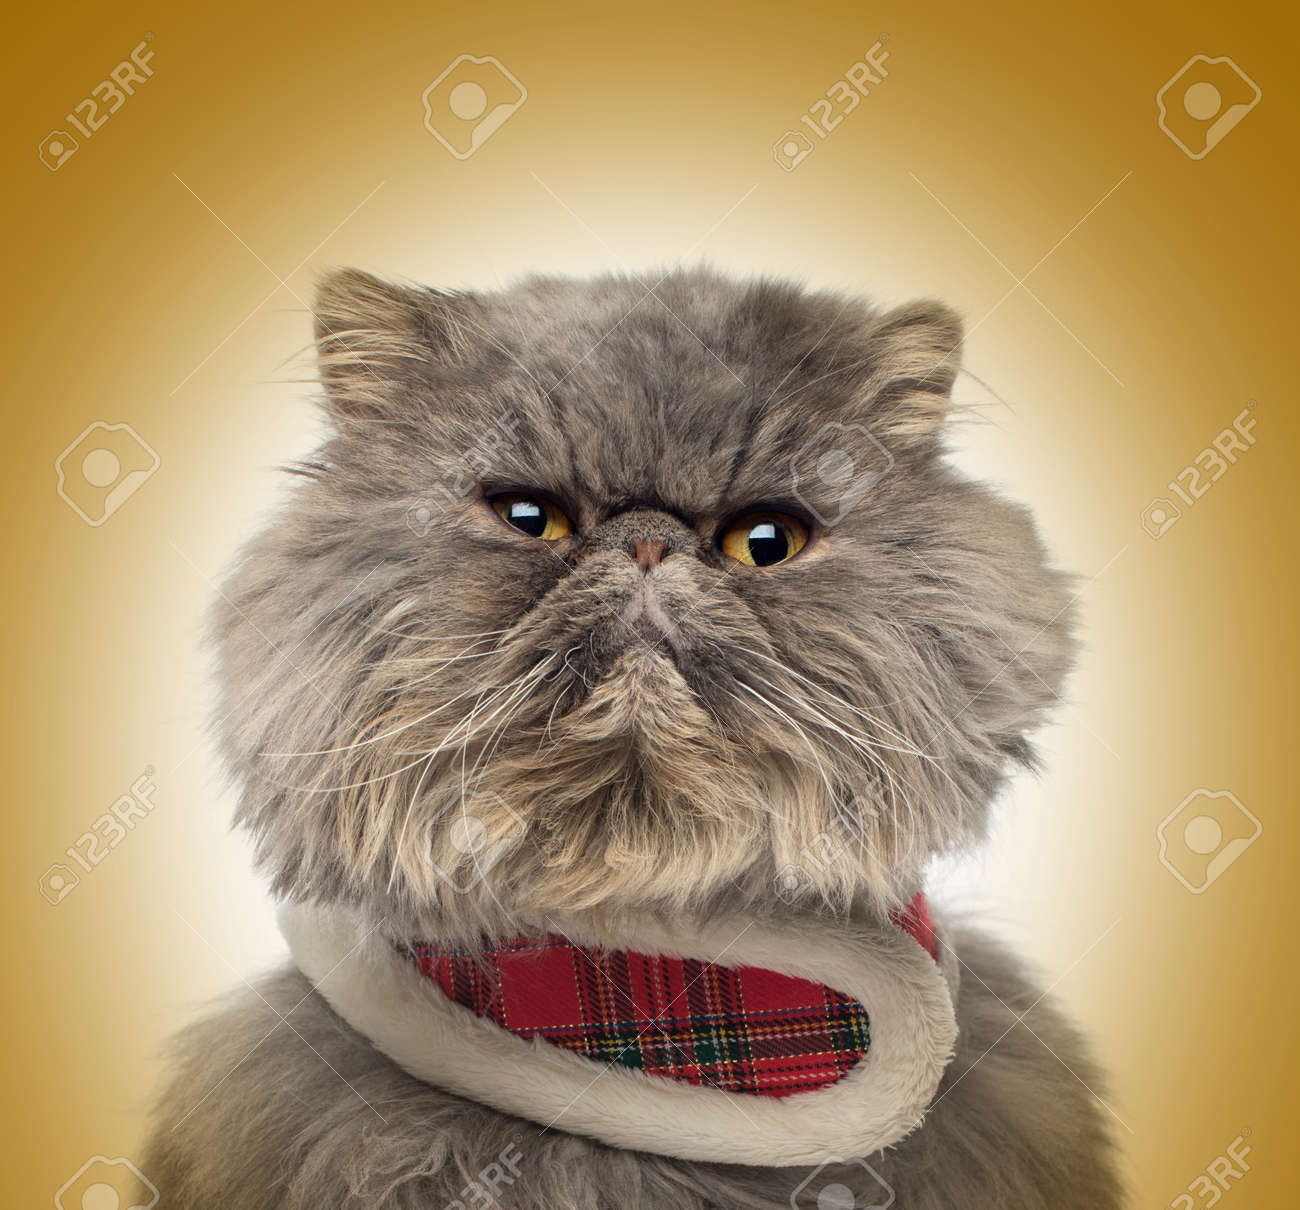 Front View A Grumpy Persian Cat Wearing A Tartan Harness